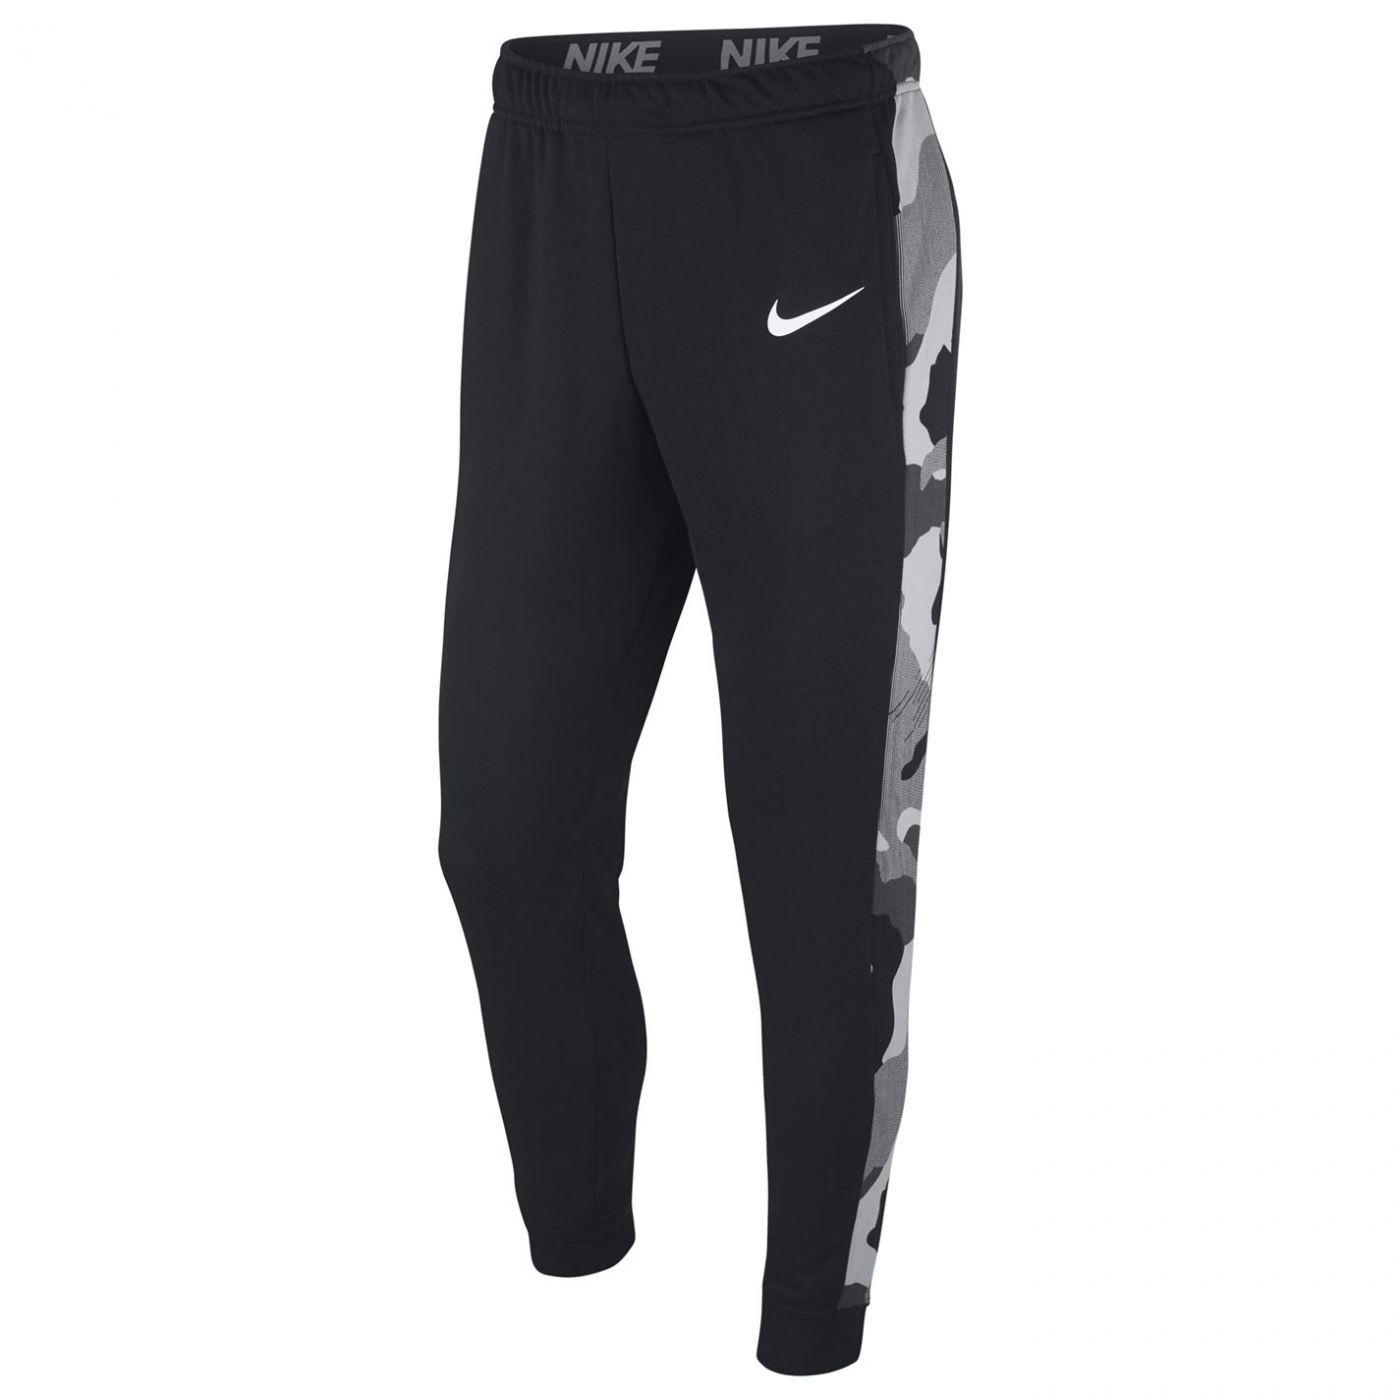 Nike Camo Jogging Pants Mens